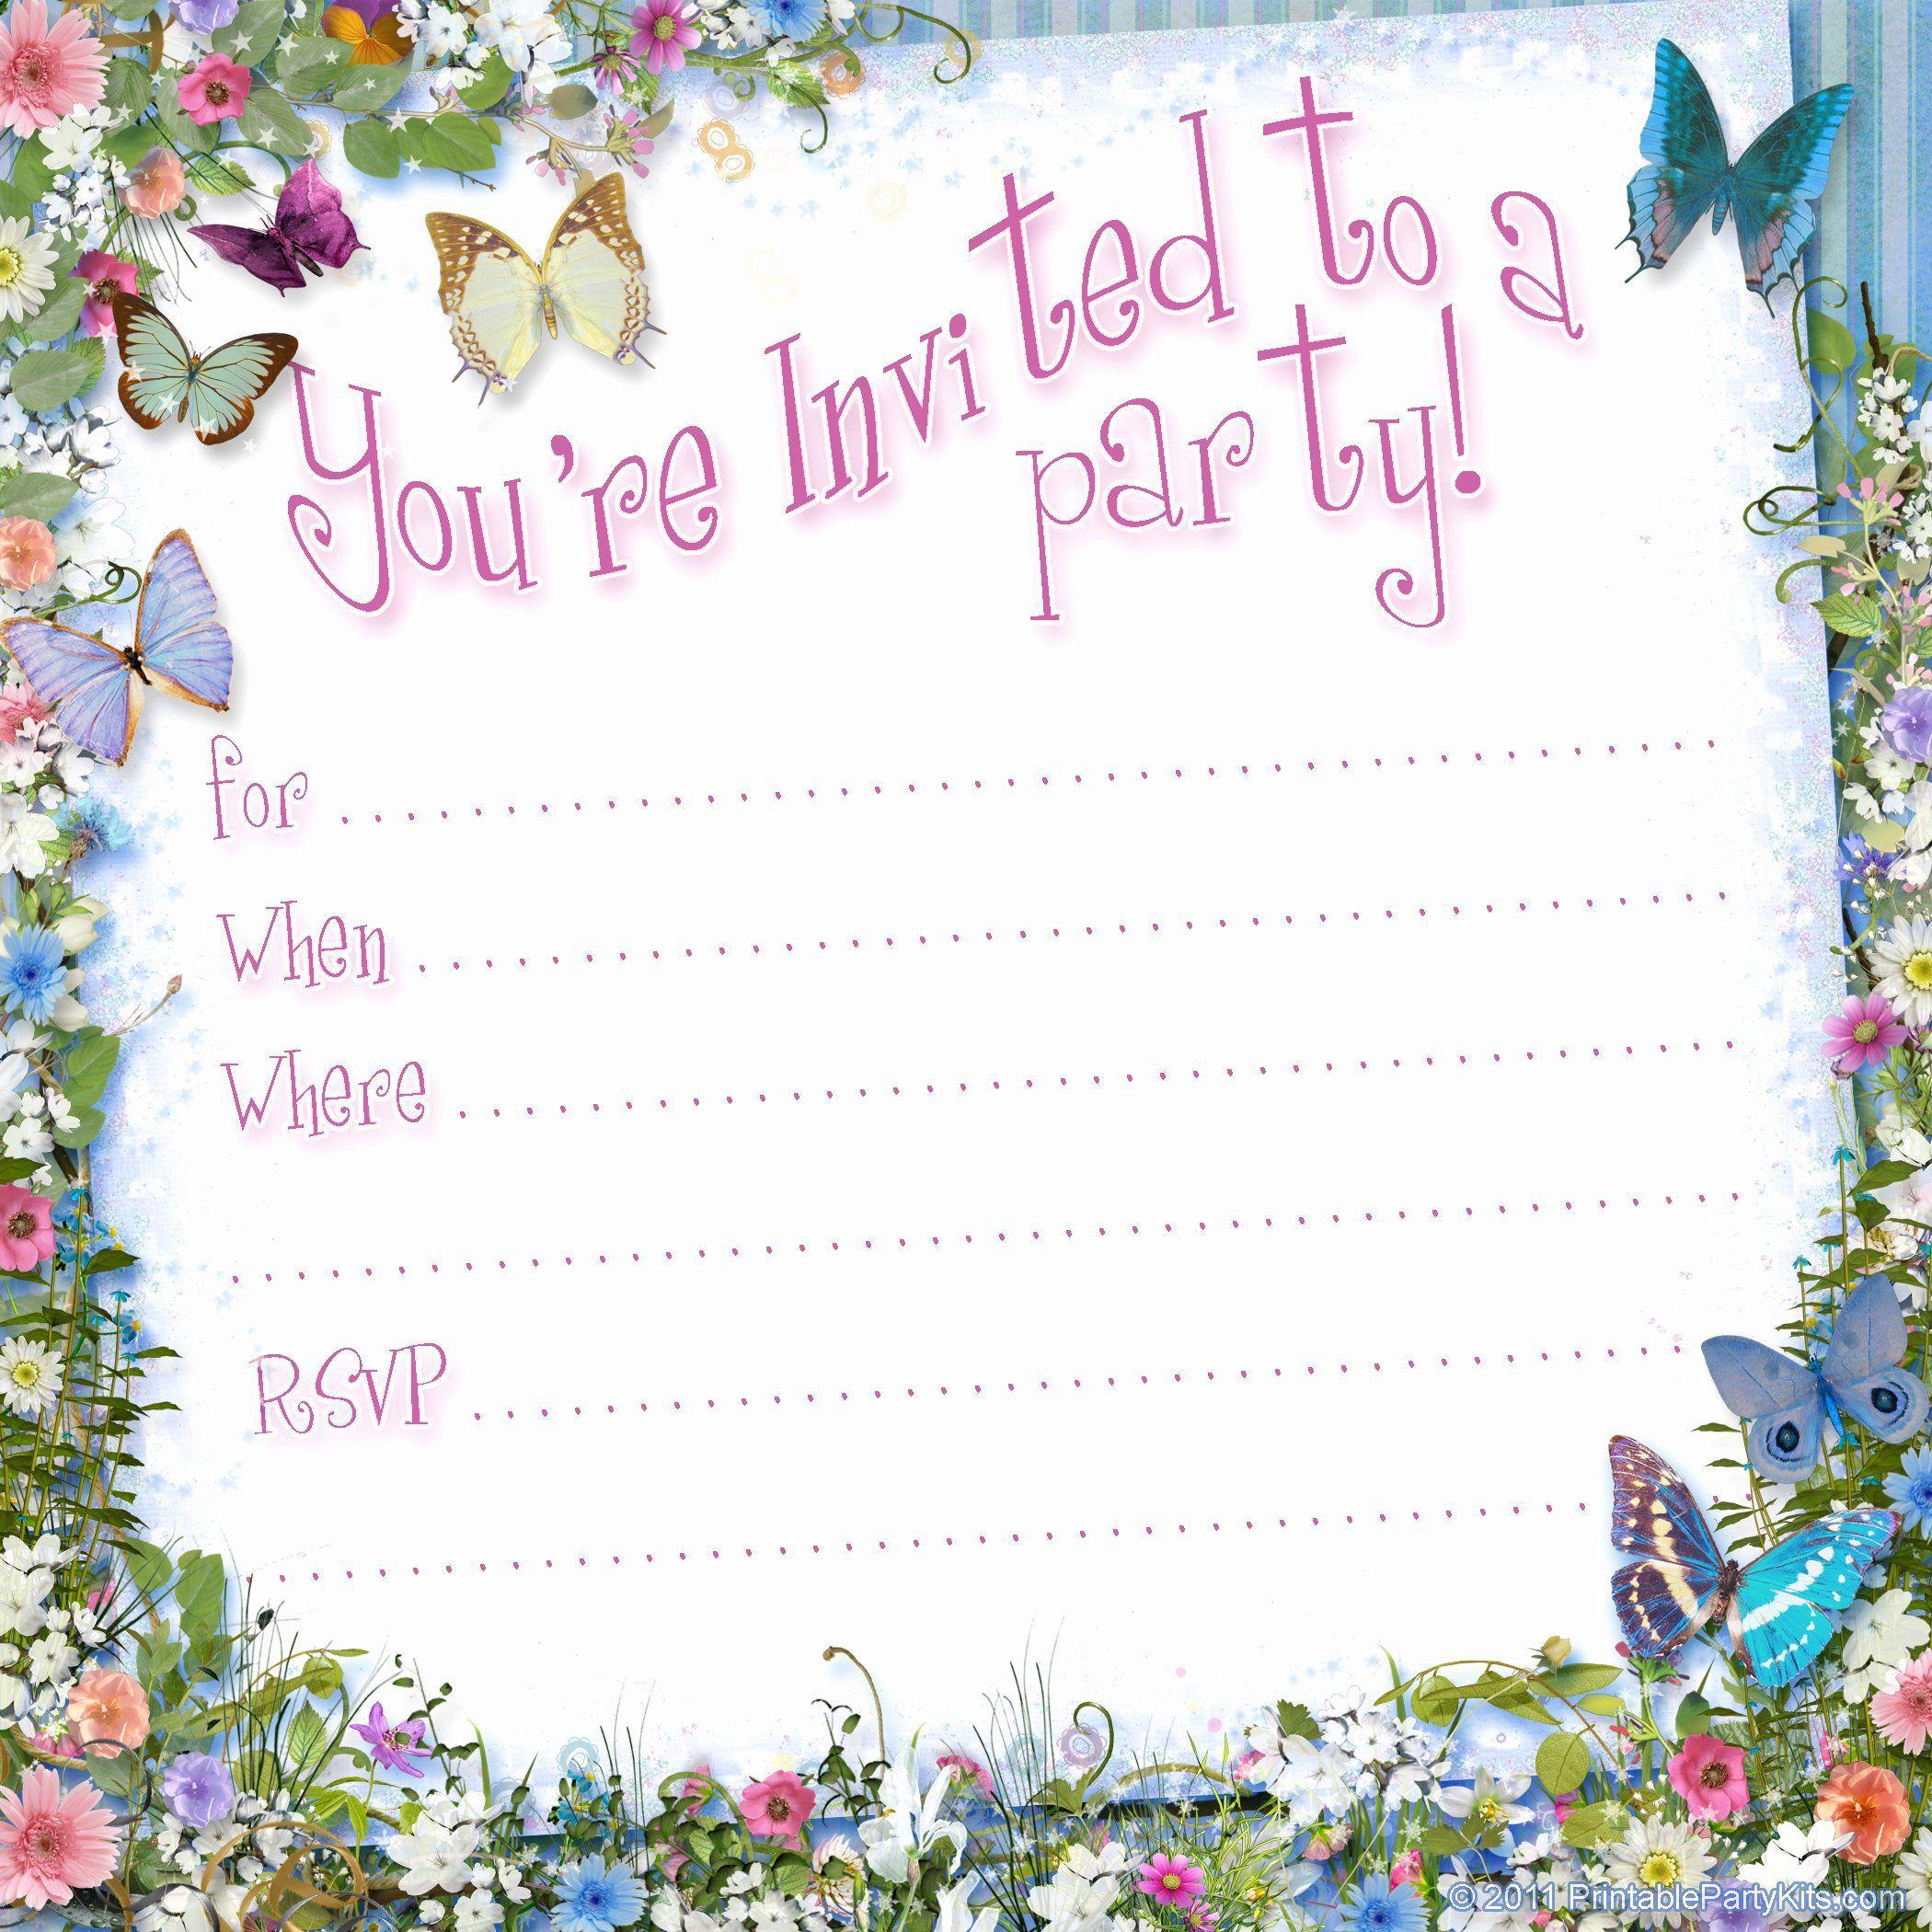 002 Fascinating Free Invite Design Printable Image  Wedding Place Card Template Birthday To PrintFull